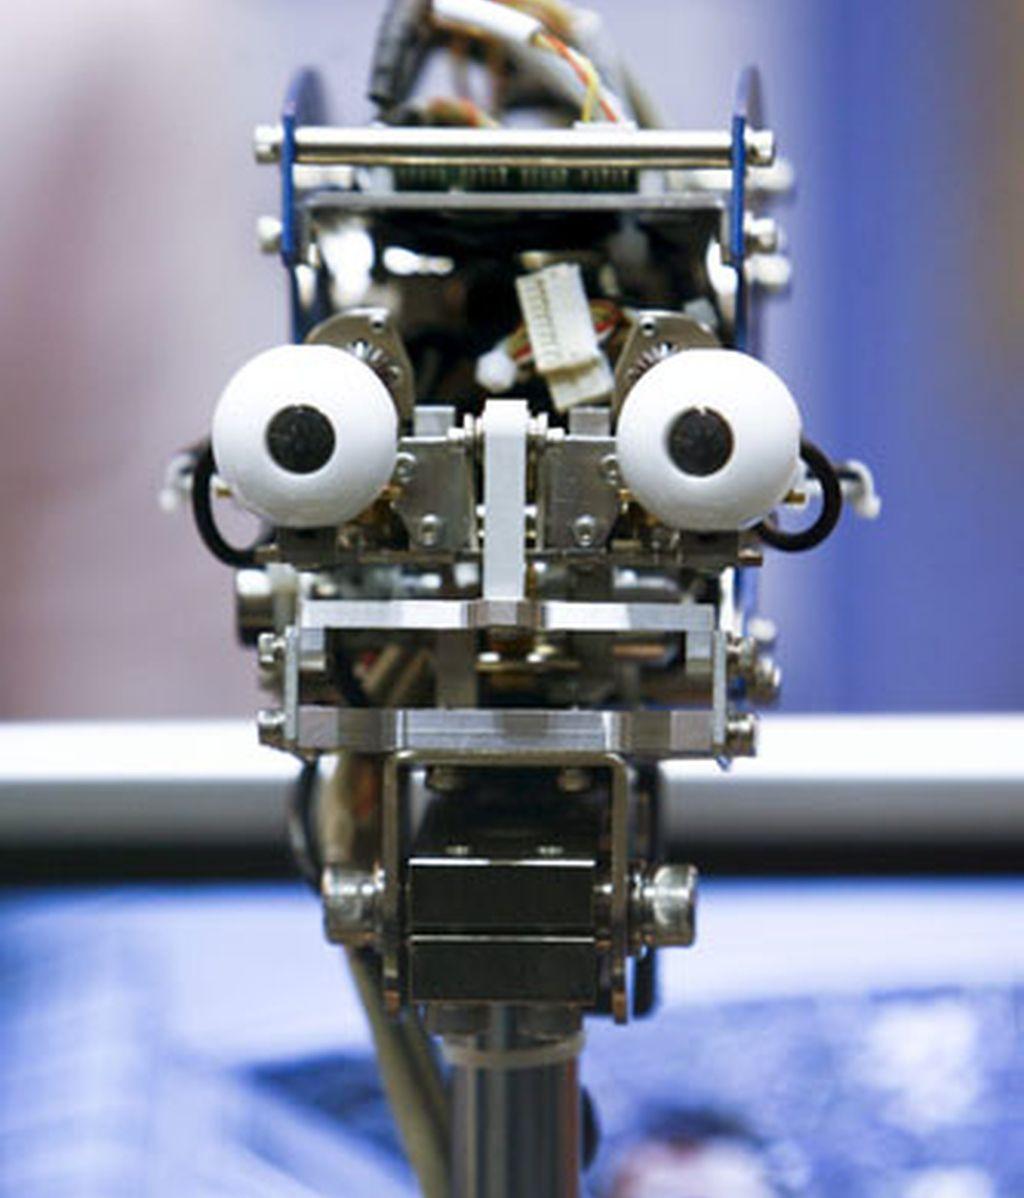 Exposición Internacional del Robot en Tokio